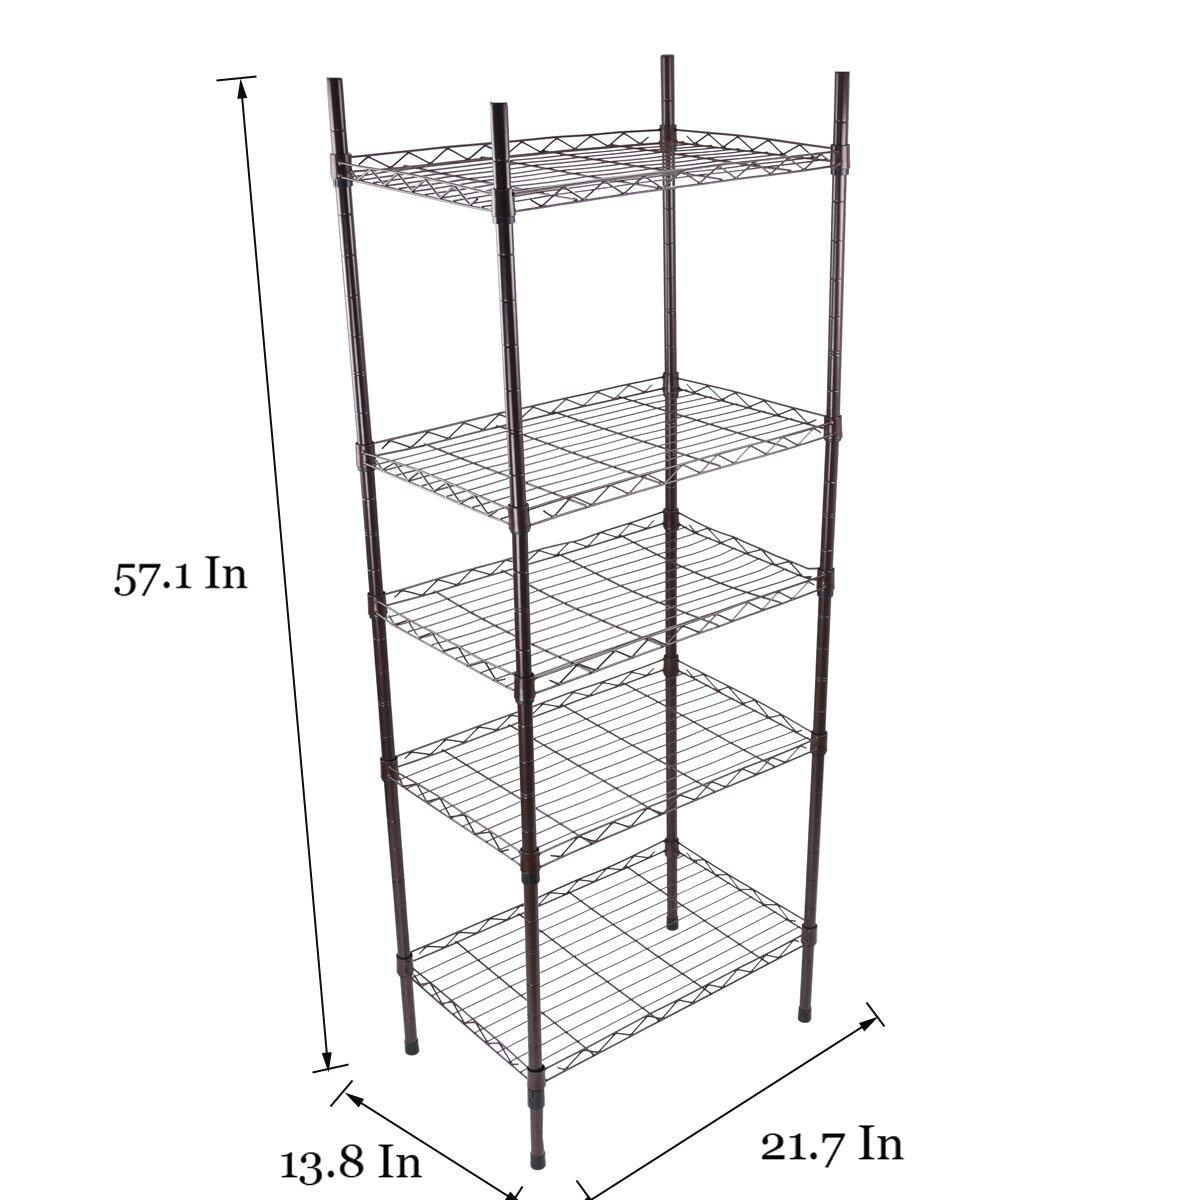 Yontree 5-Tier Wire Shelving Shelves Unit Steel Storage Rack Baker Rack Kitchen Laundry Organization in Brown on Wheels 21.7x13.8x57.1 in. by Yontree (Image #2)